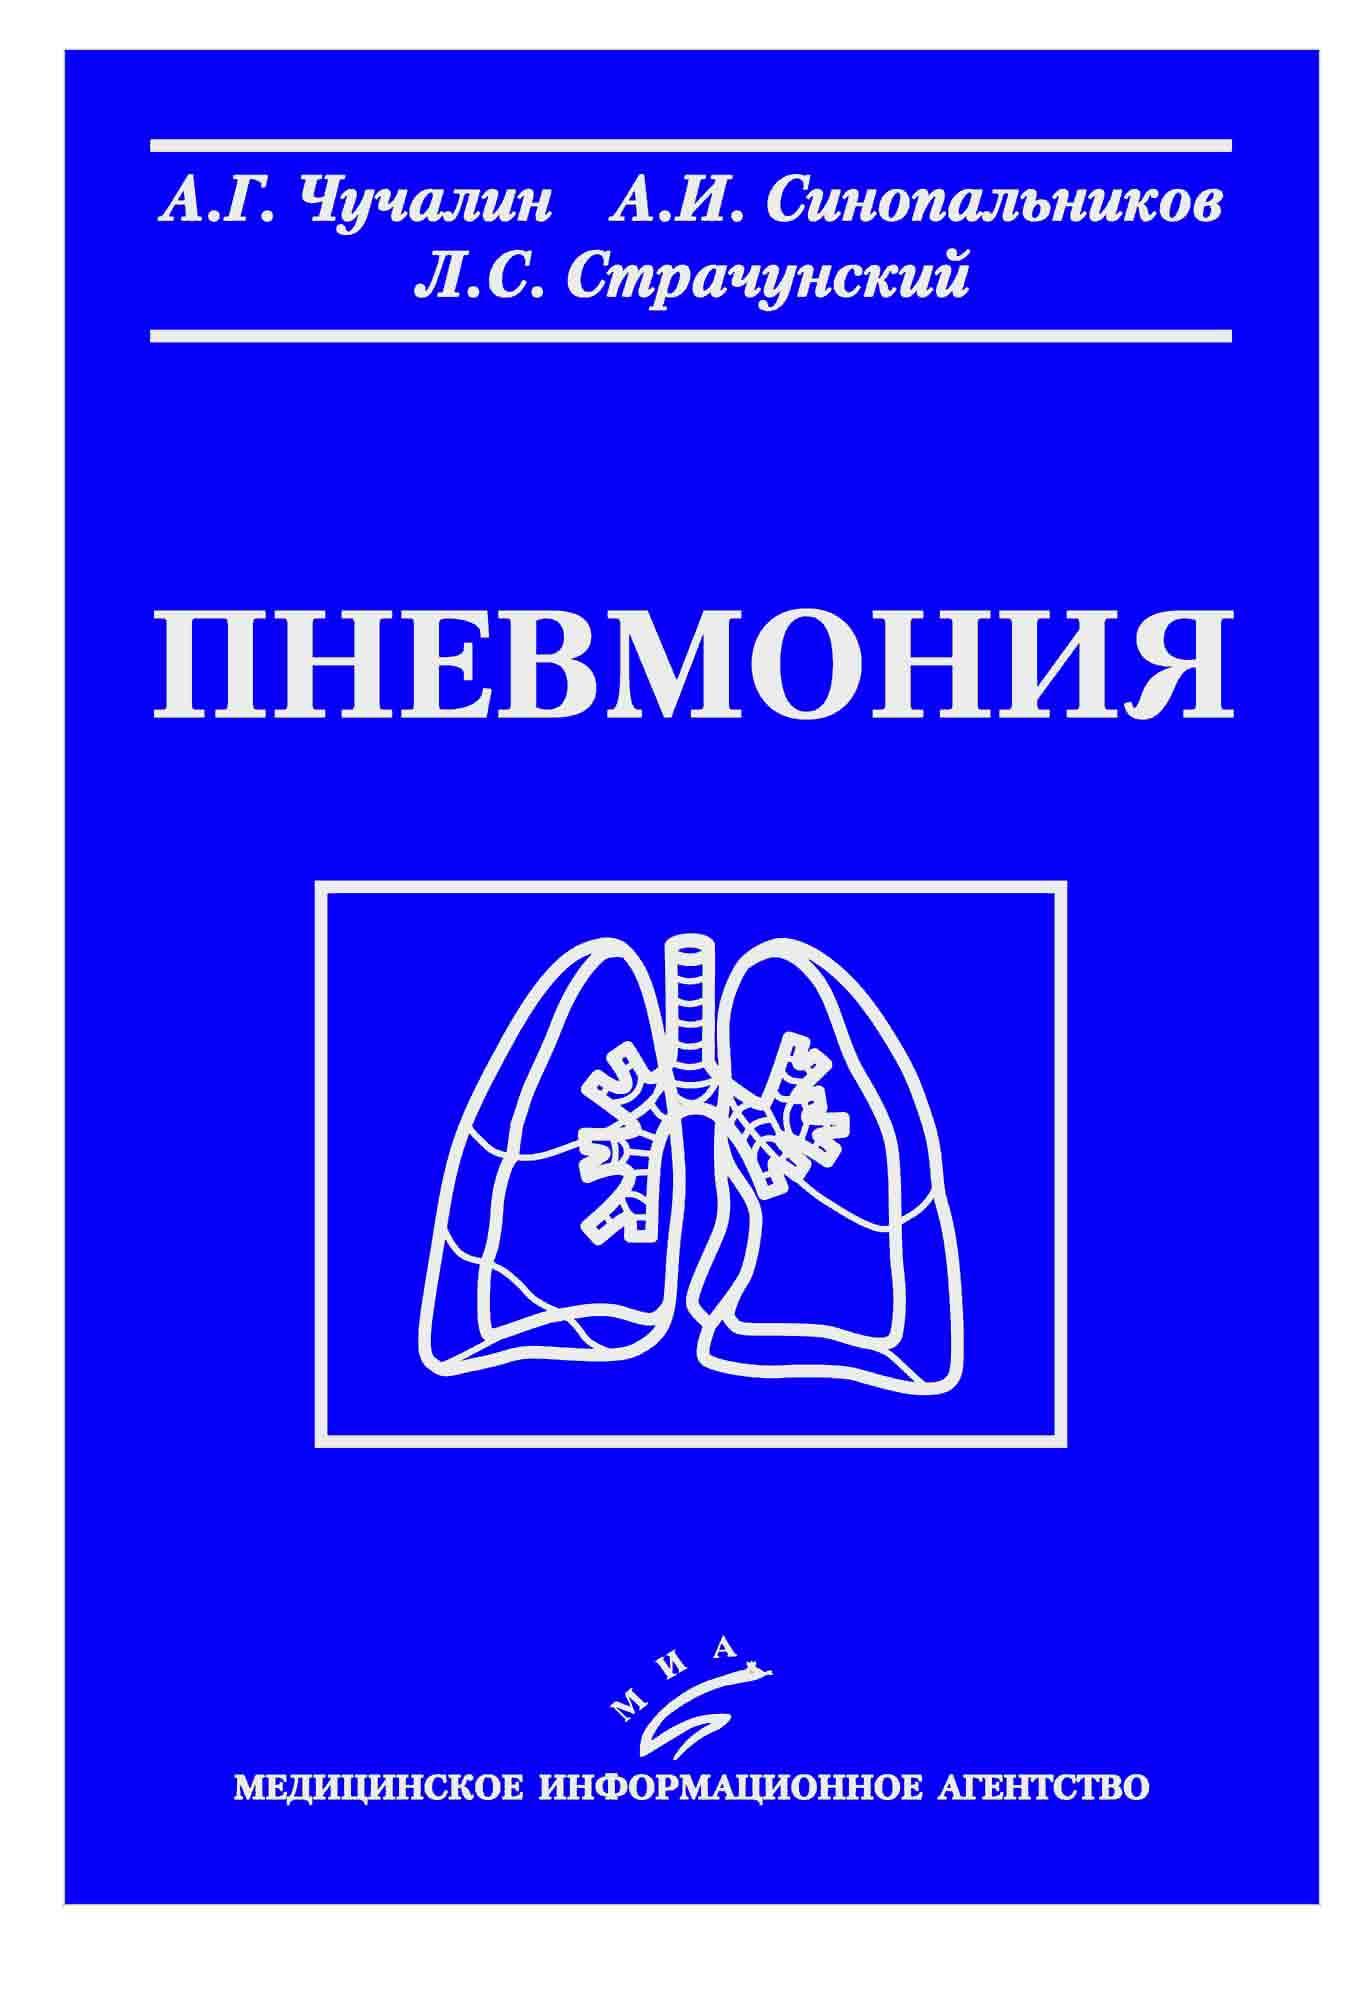 Александр Чучалин (Пульмонолог). Биография. Семья. Про короновирус